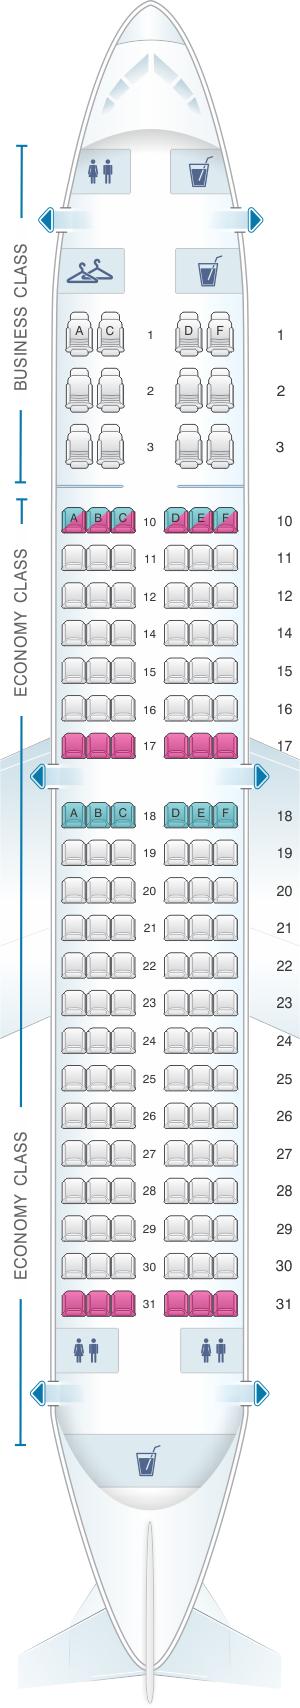 Seat map for Airtran Airways Boeing B737 700